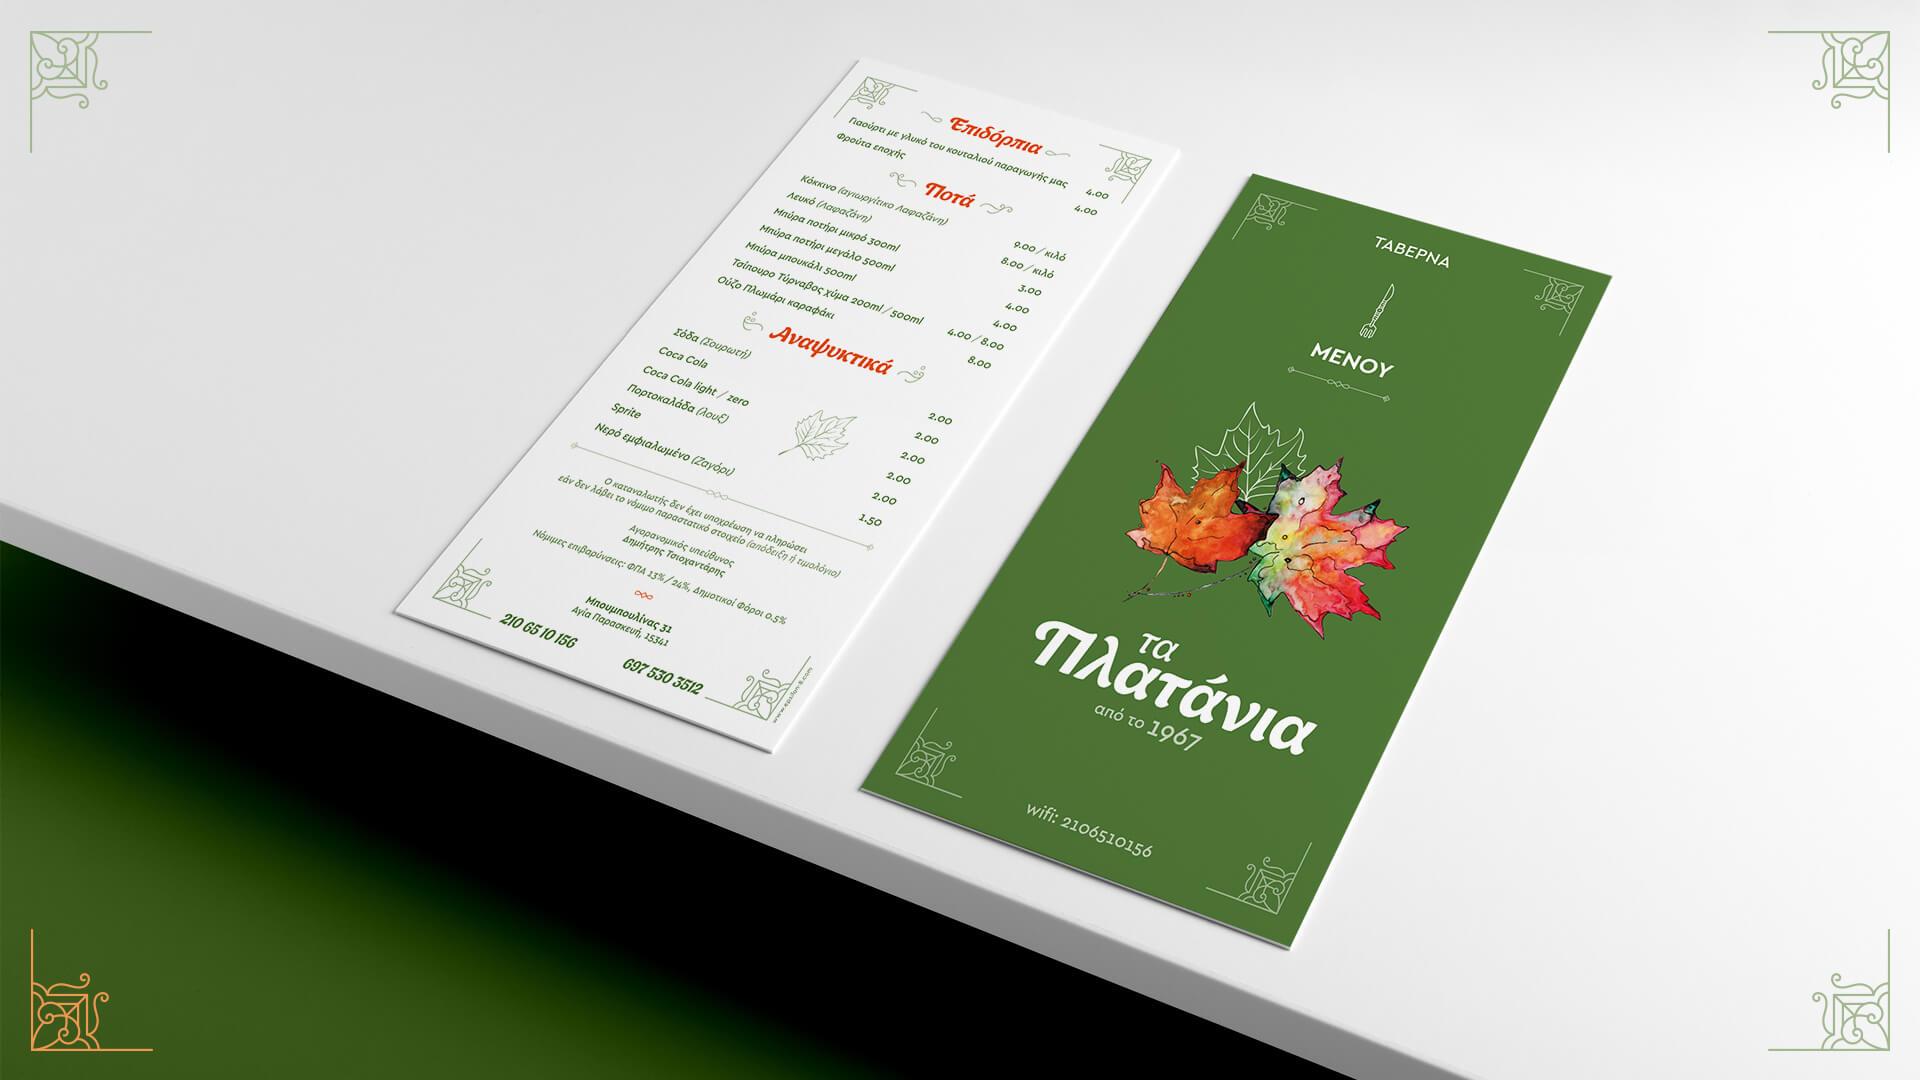 Platania-Covers